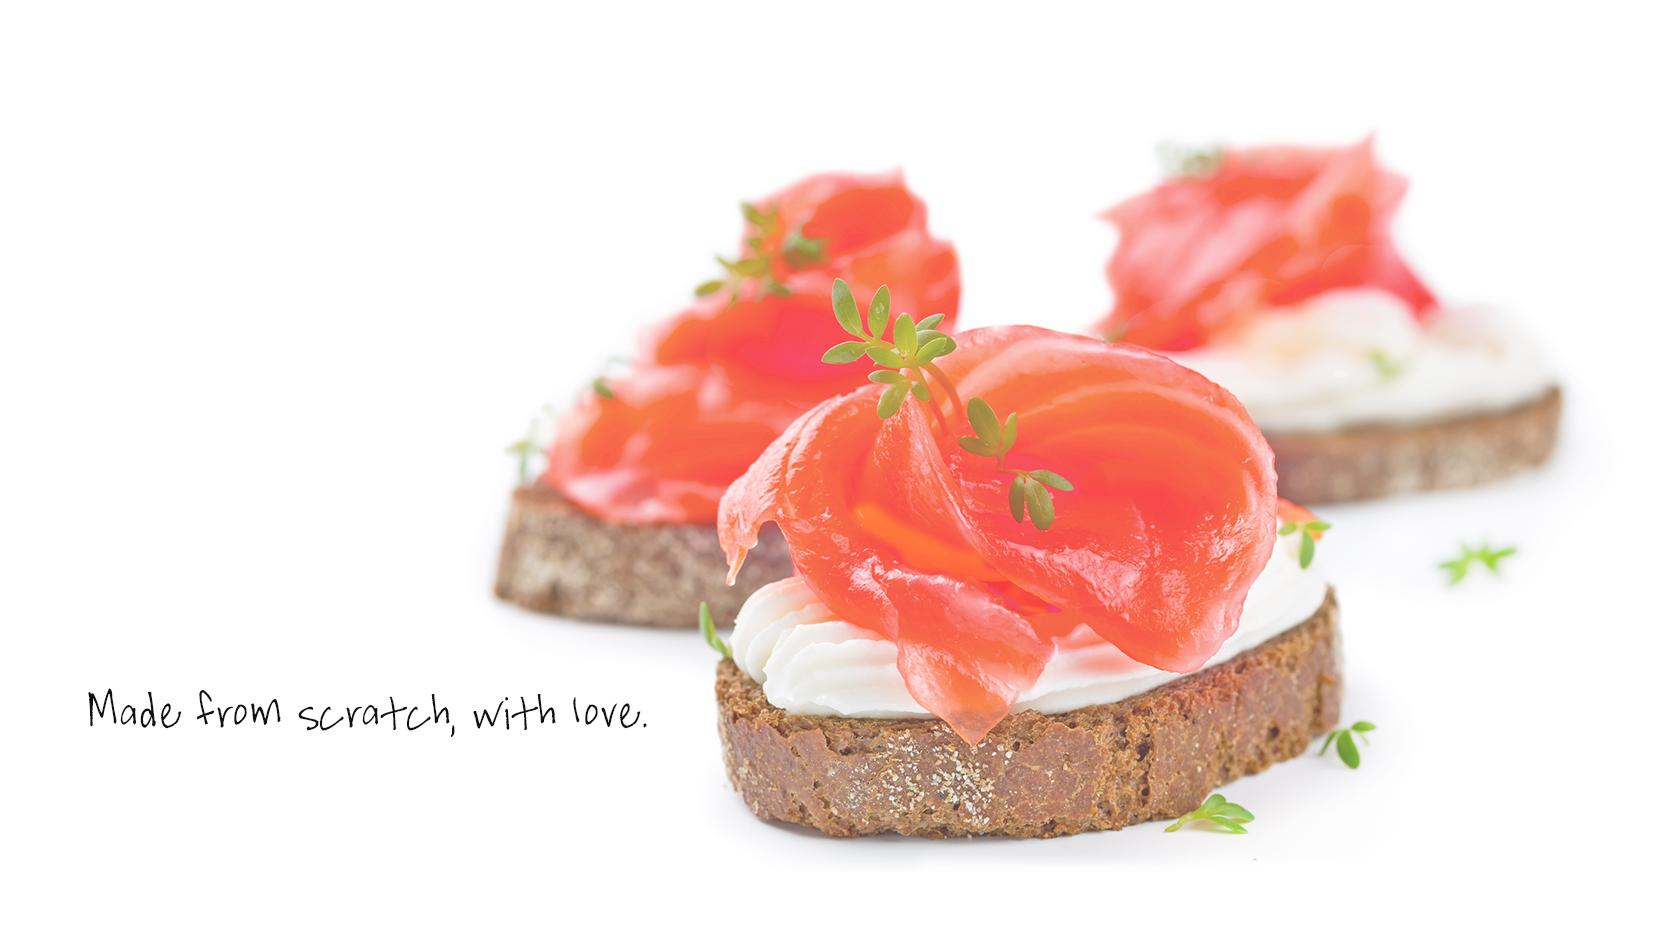 salmon image.jpg